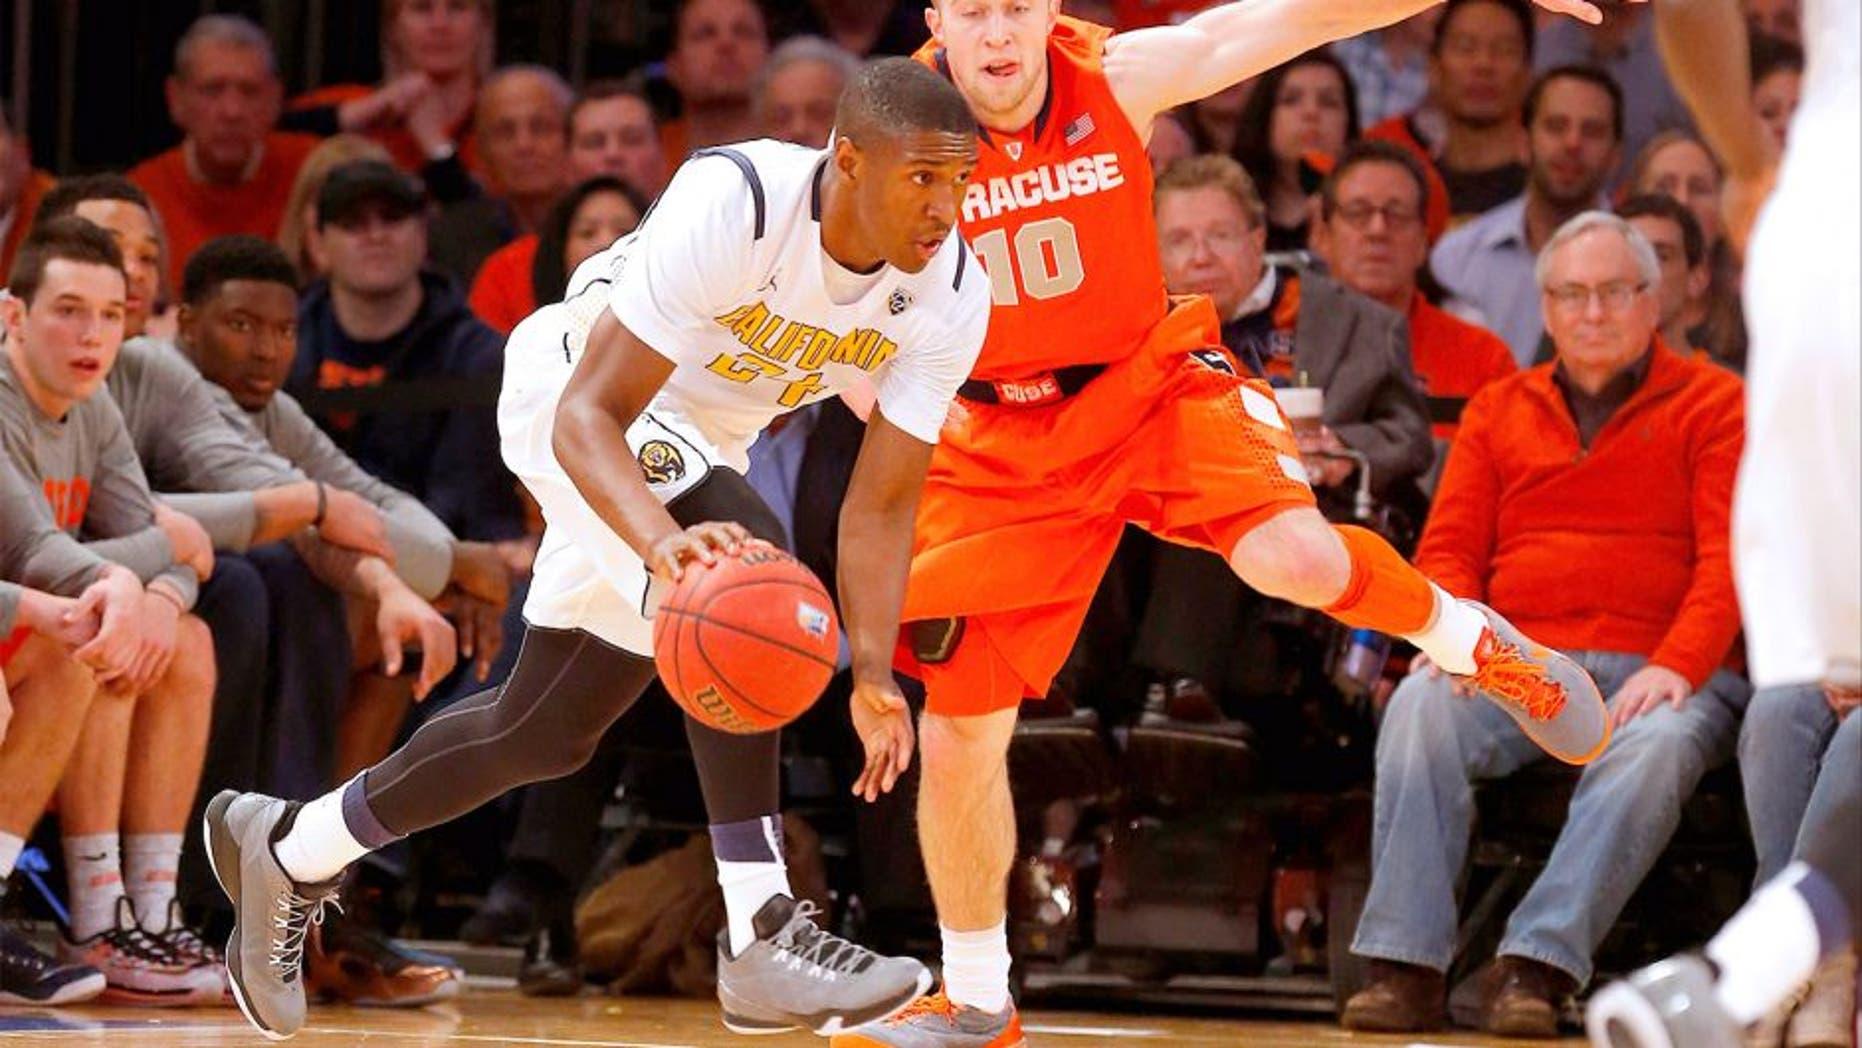 Nov 20, 2014; New York, NY, USA; California Golden Bears guard Jordan Mathews (24) works against Syracuse Orange guard Trevor Cooney (10) during the first half at Madison Square Garden. Mandatory Credit: Jim O'Connor-USA TODAY Sports